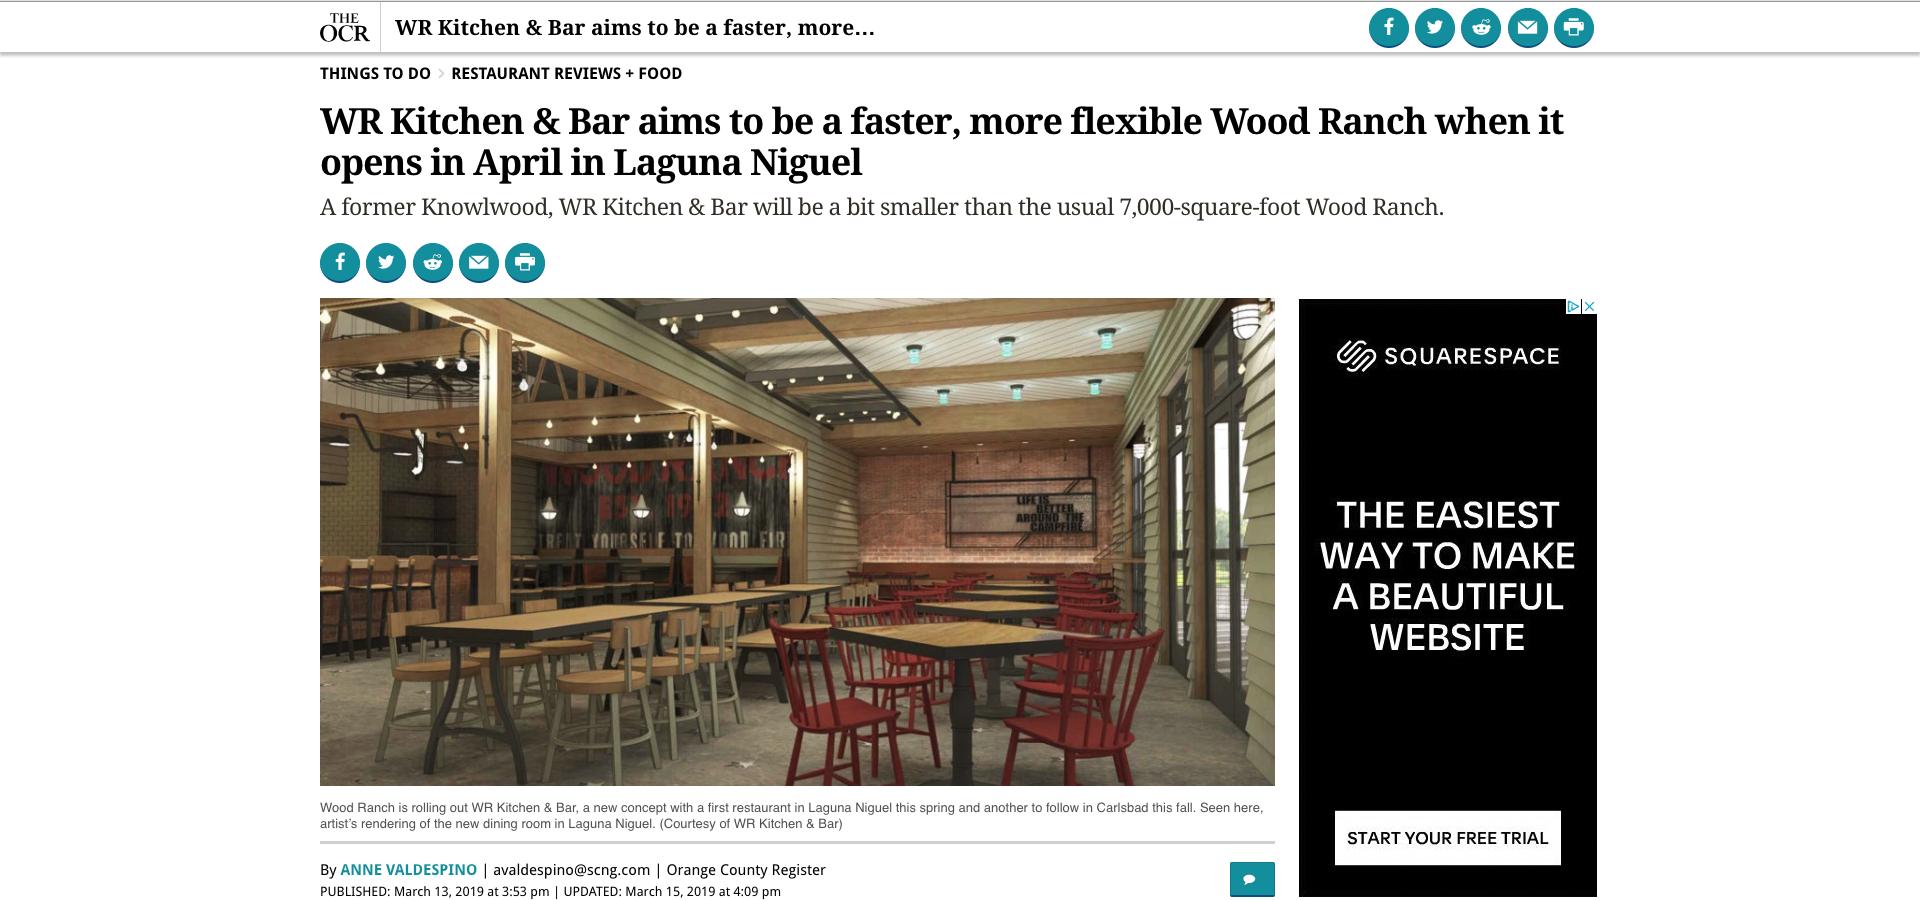 The OCR - WR Kitchen & Bar